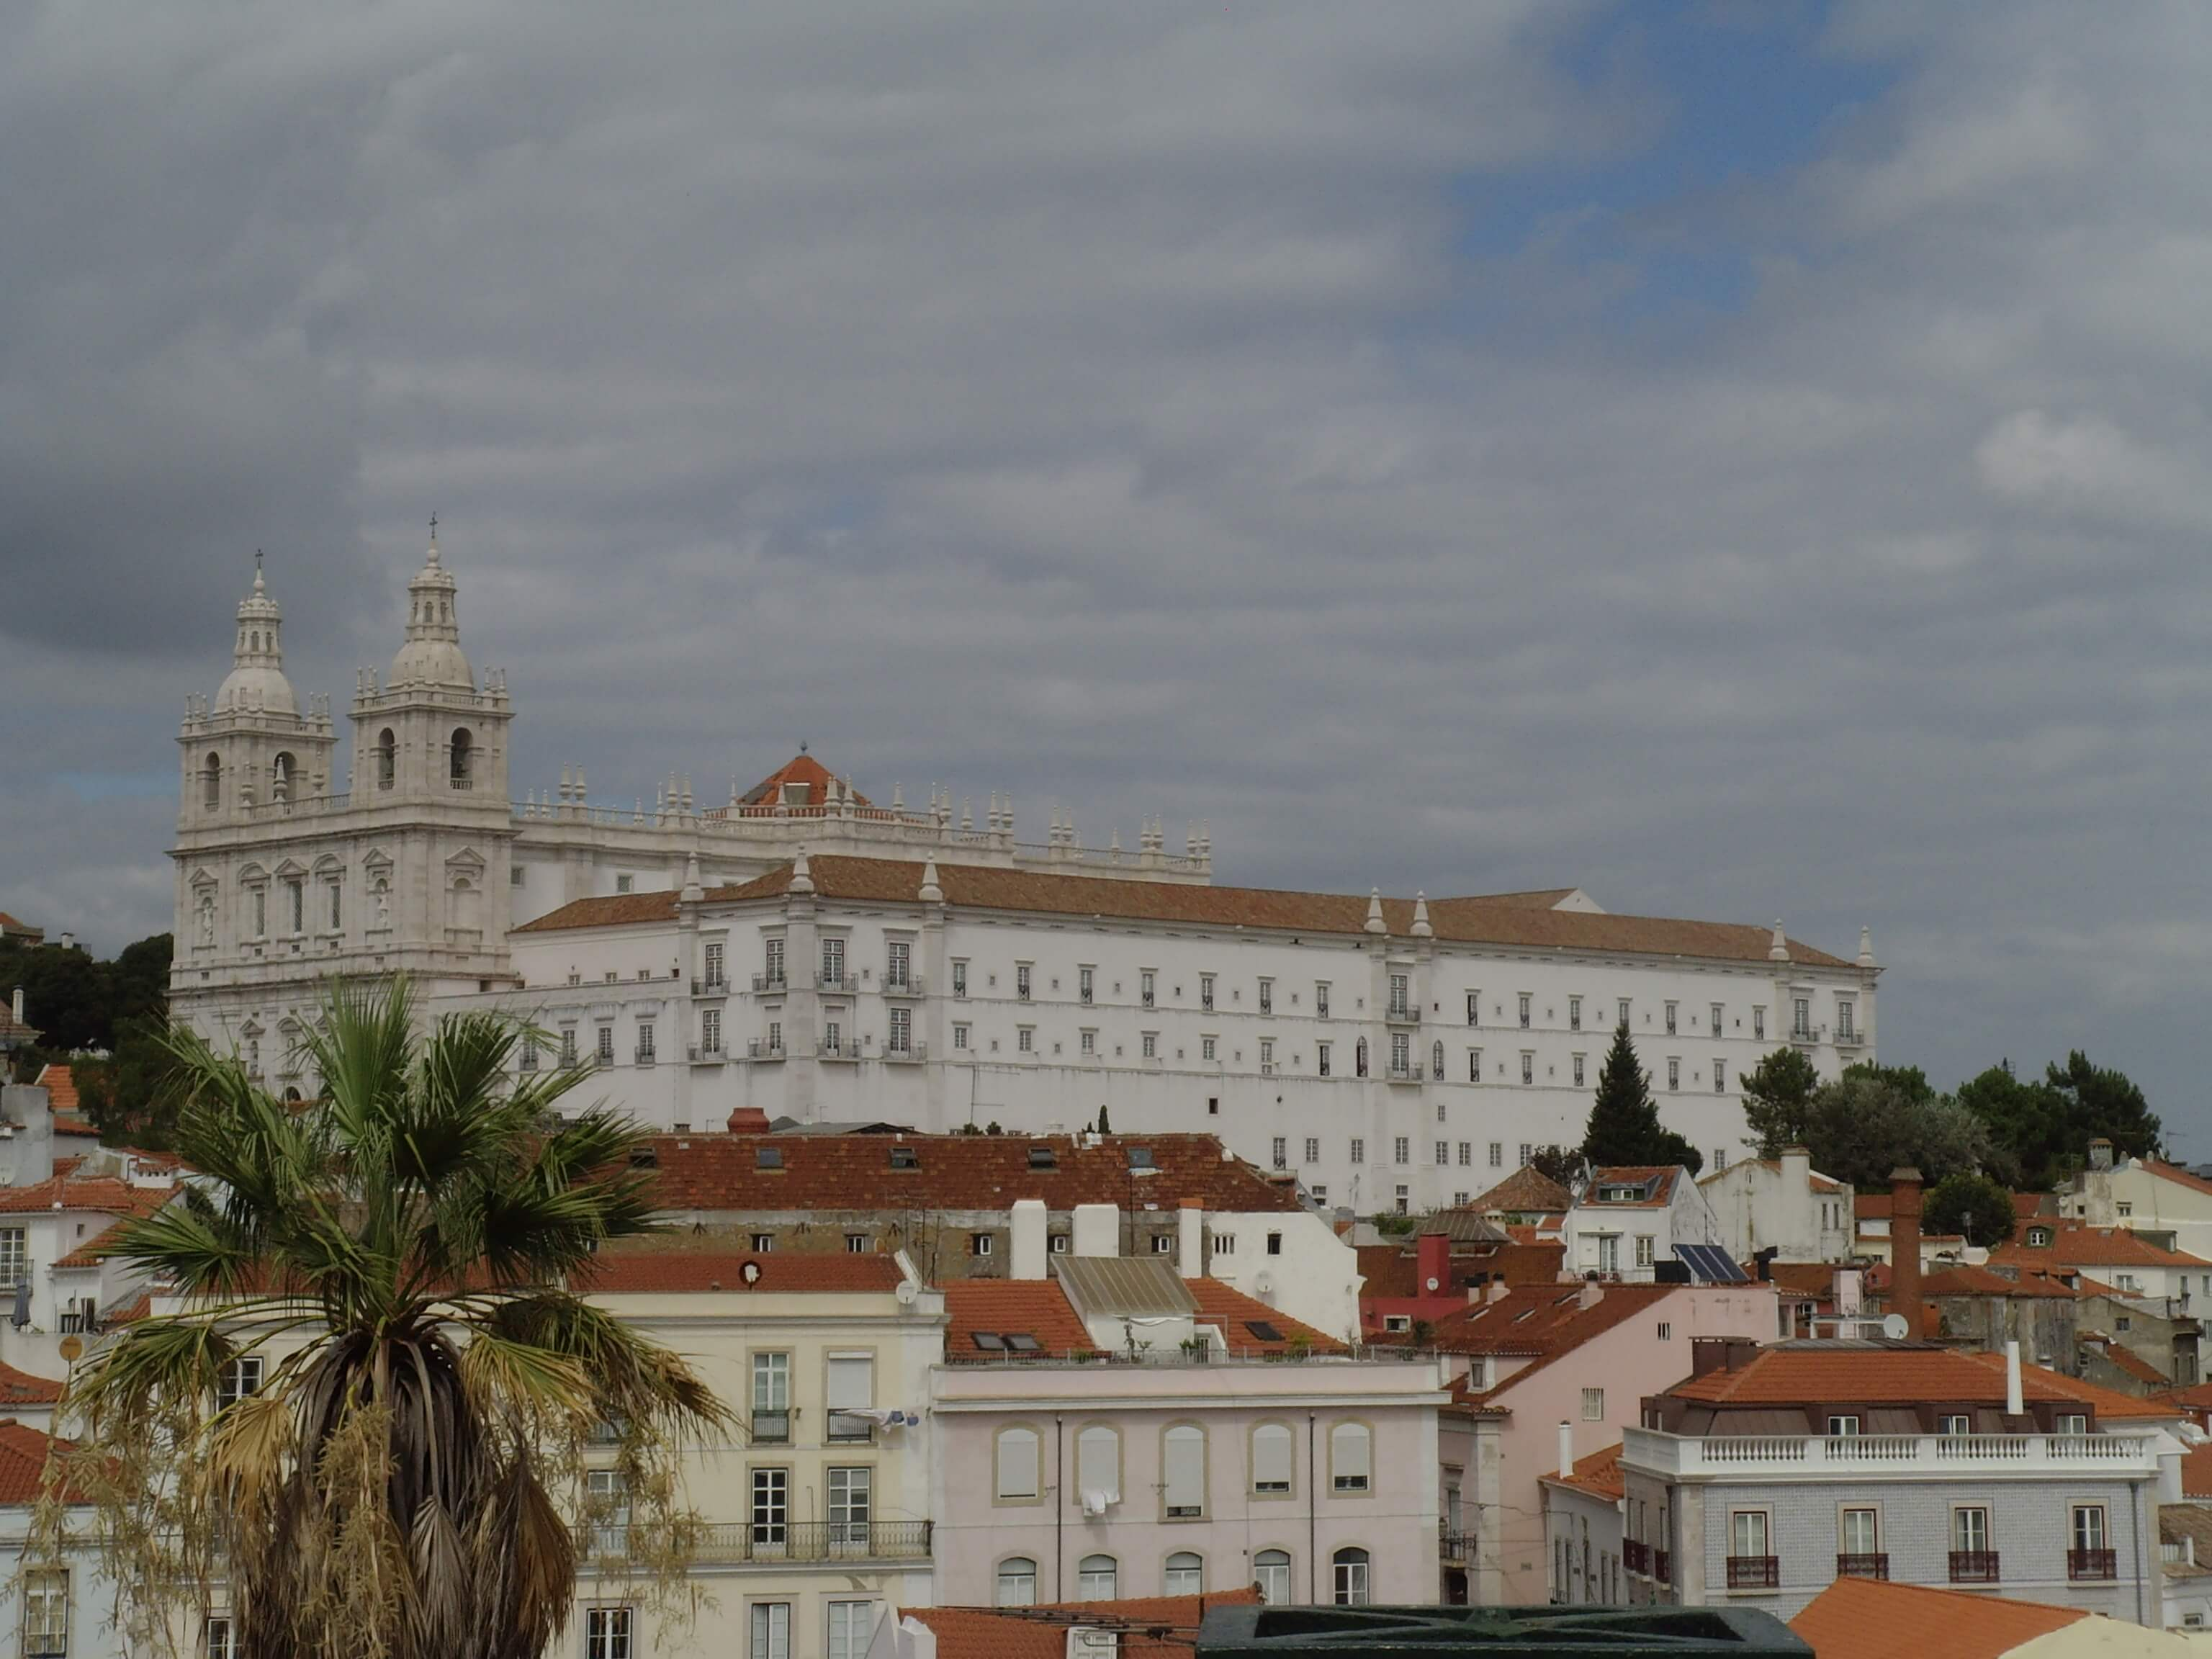 Rondreizen Portugal Lissabon klooster